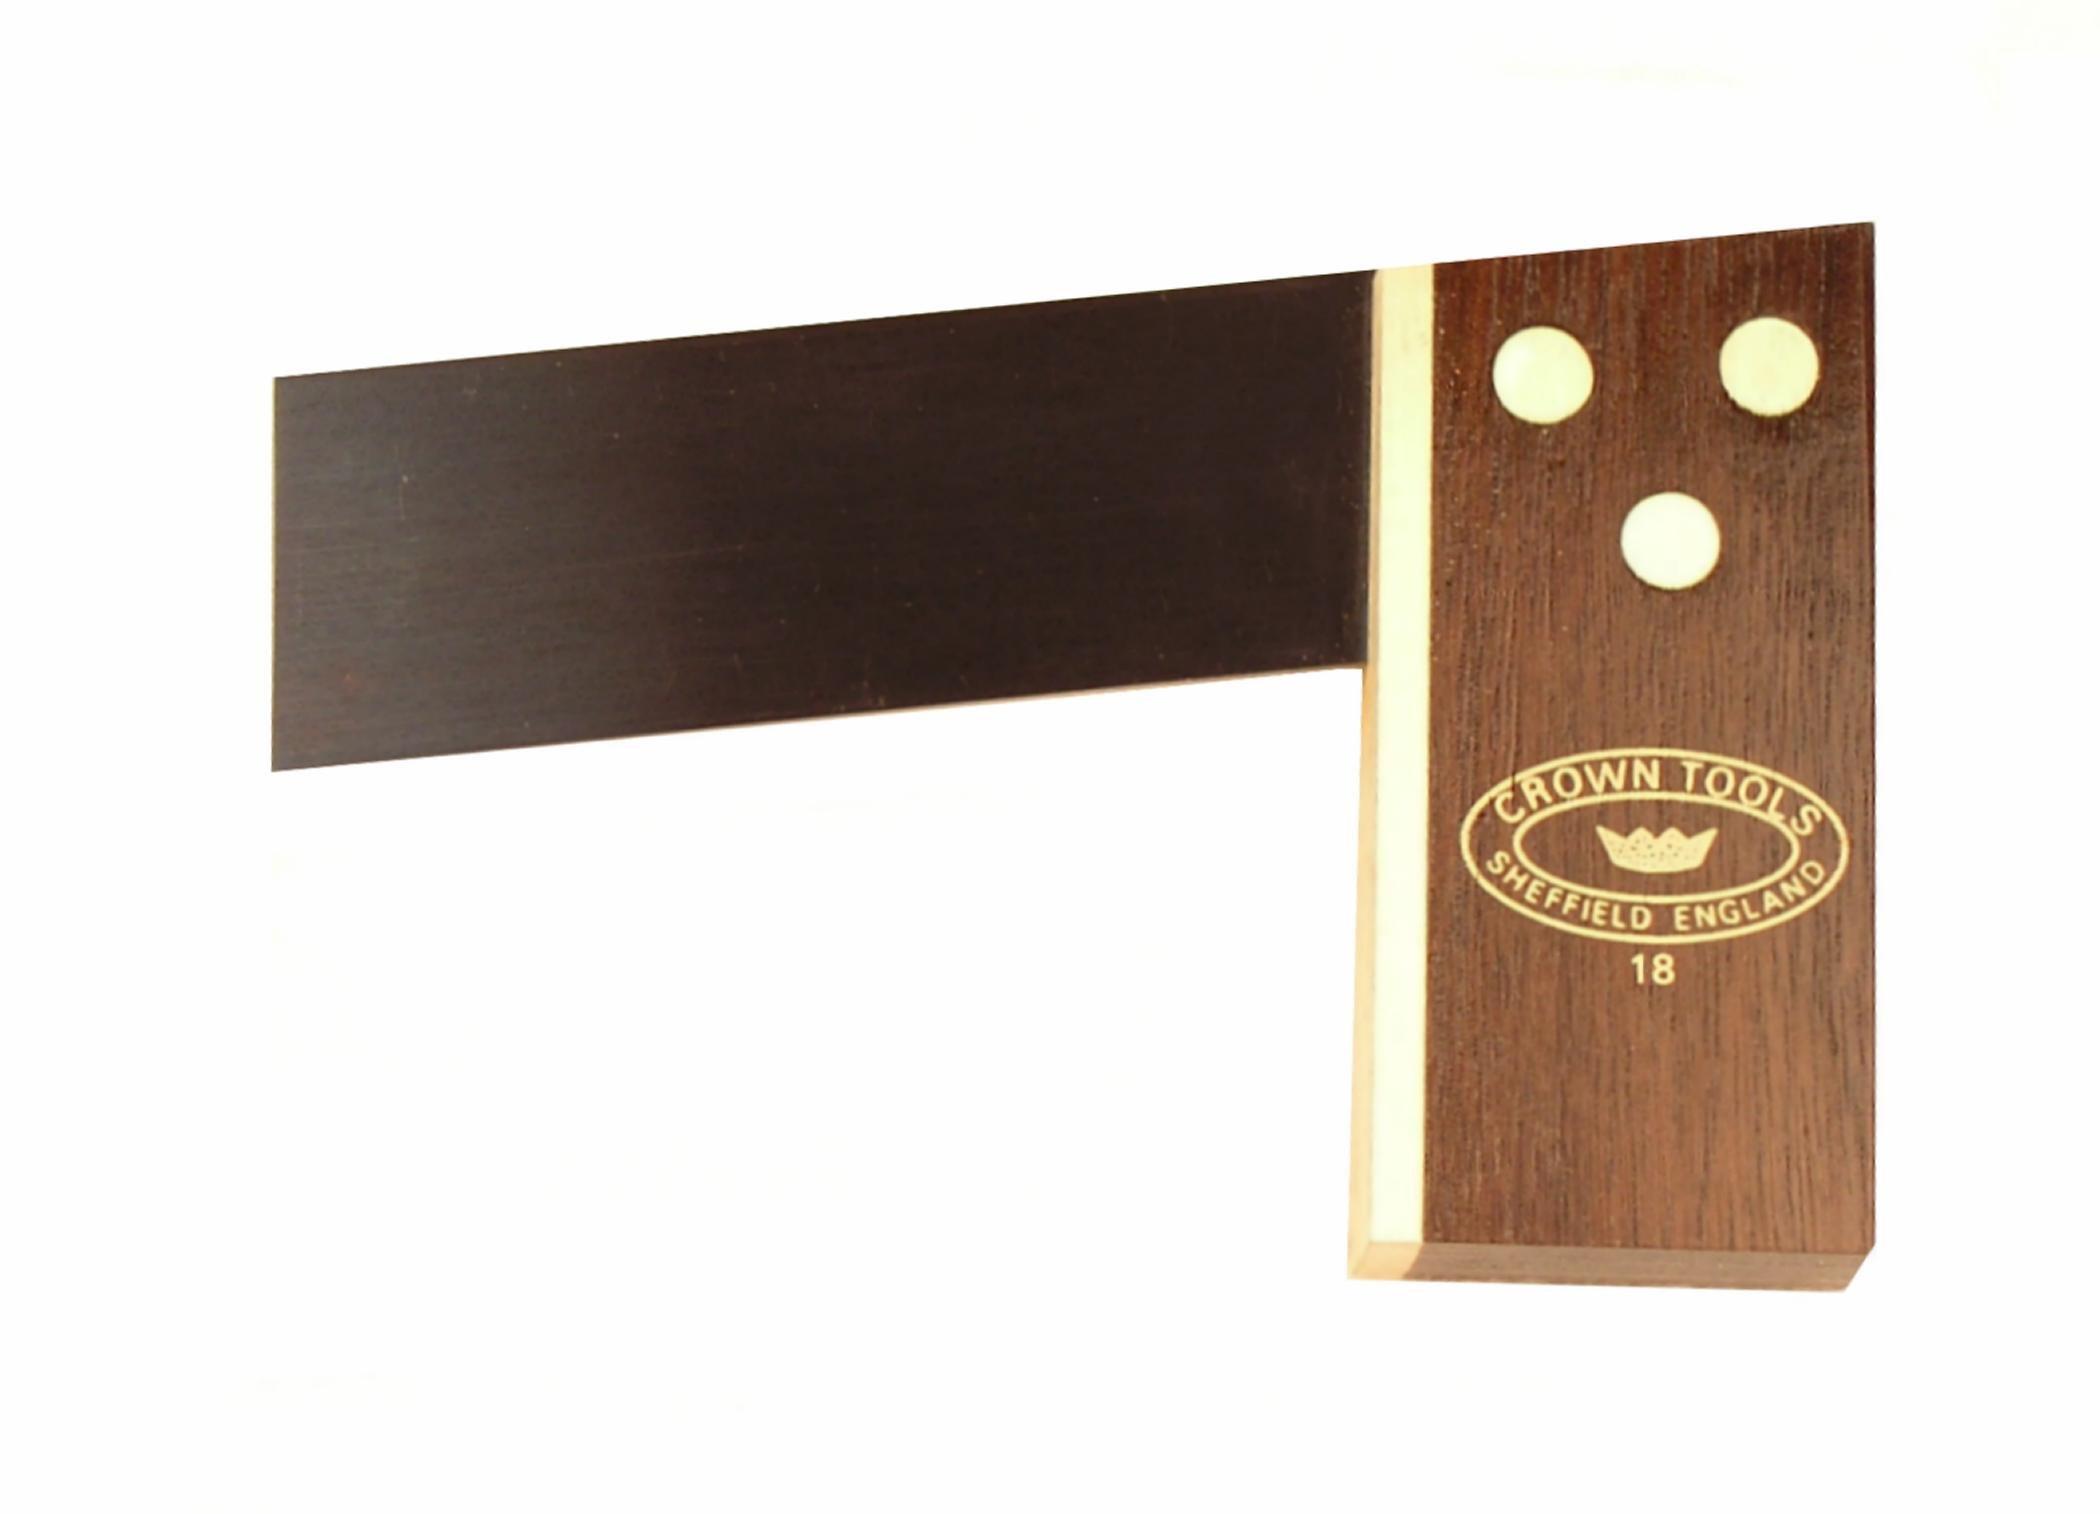 Crown 1238M 1:8 Hardwood Miniature Rosewood Dovetail Square